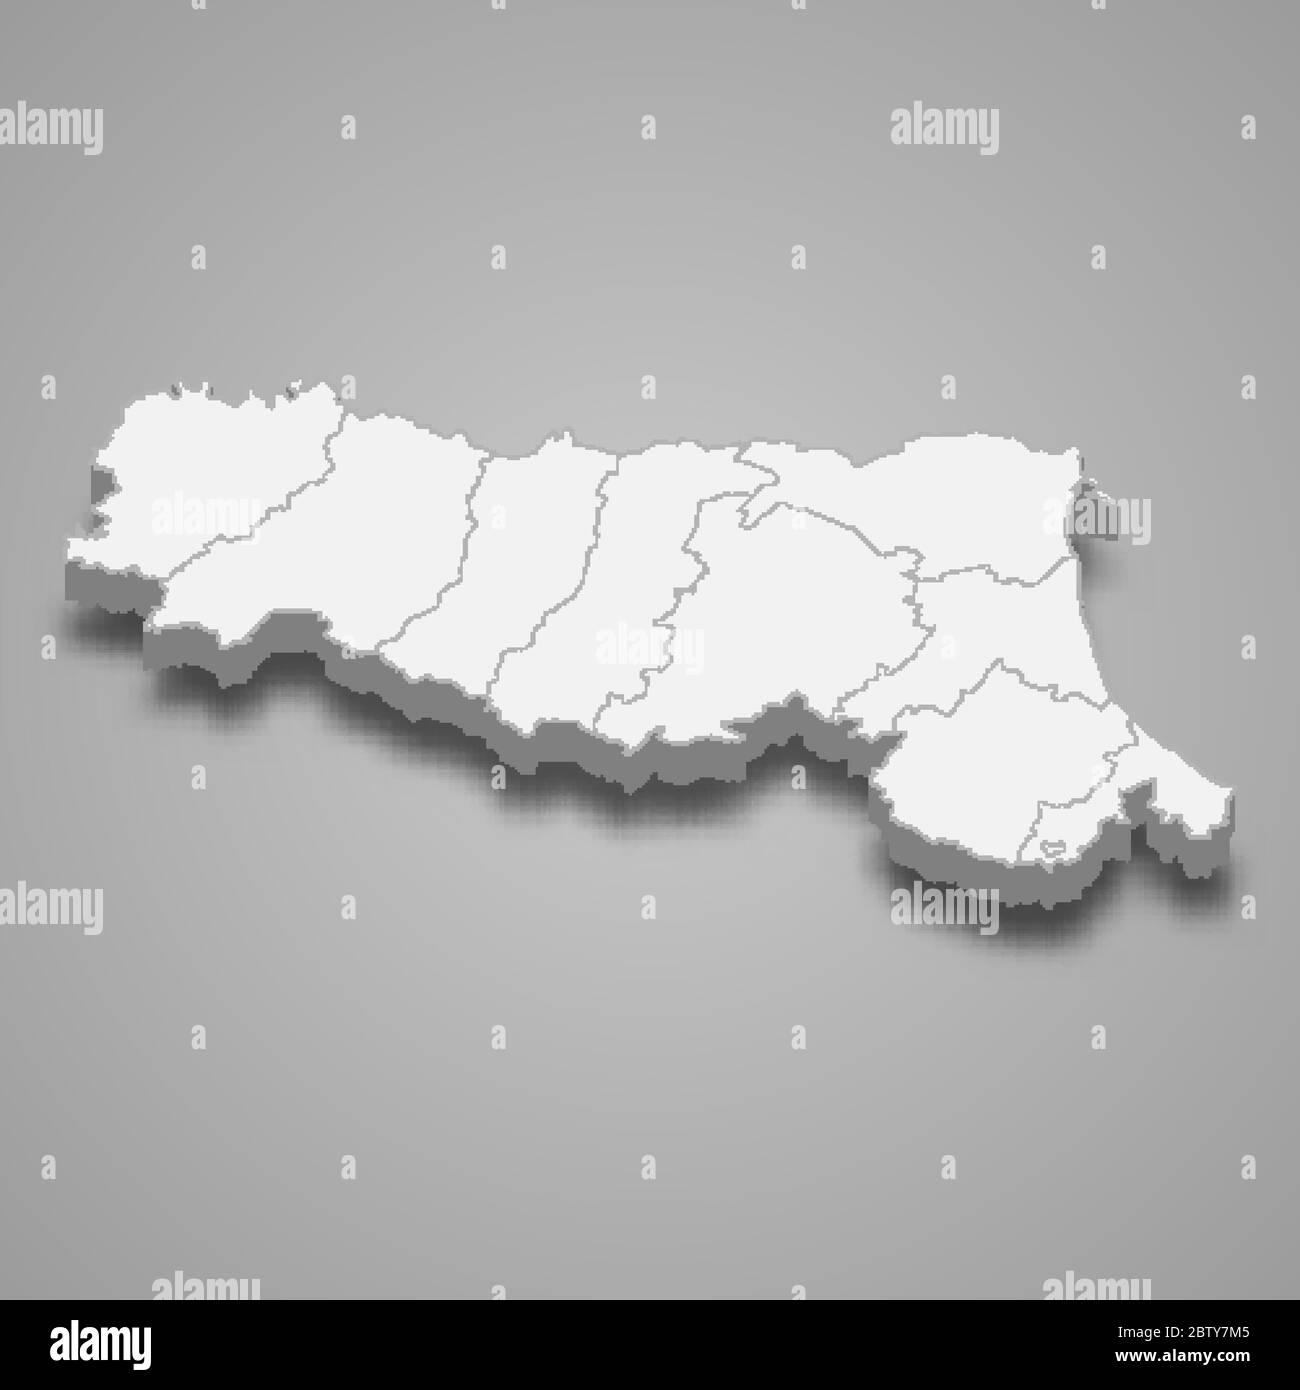 Cartina Topografica Emilia Romagna.Emilia Romagna Map High Resolution Stock Photography And Images Alamy